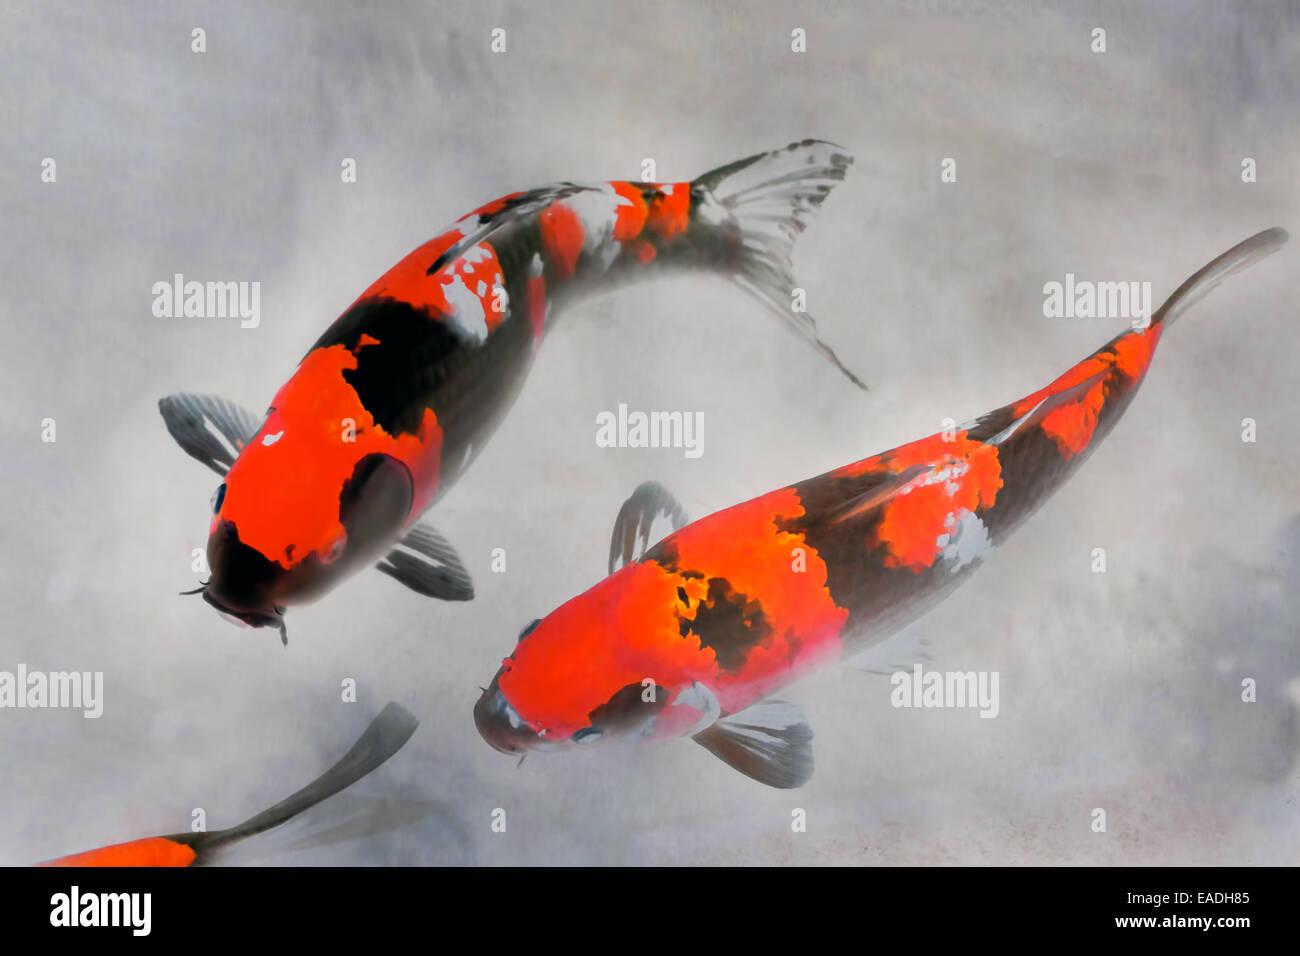 Koi Fish Painting Stock Photos & Koi Fish Painting Stock Images - Alamy